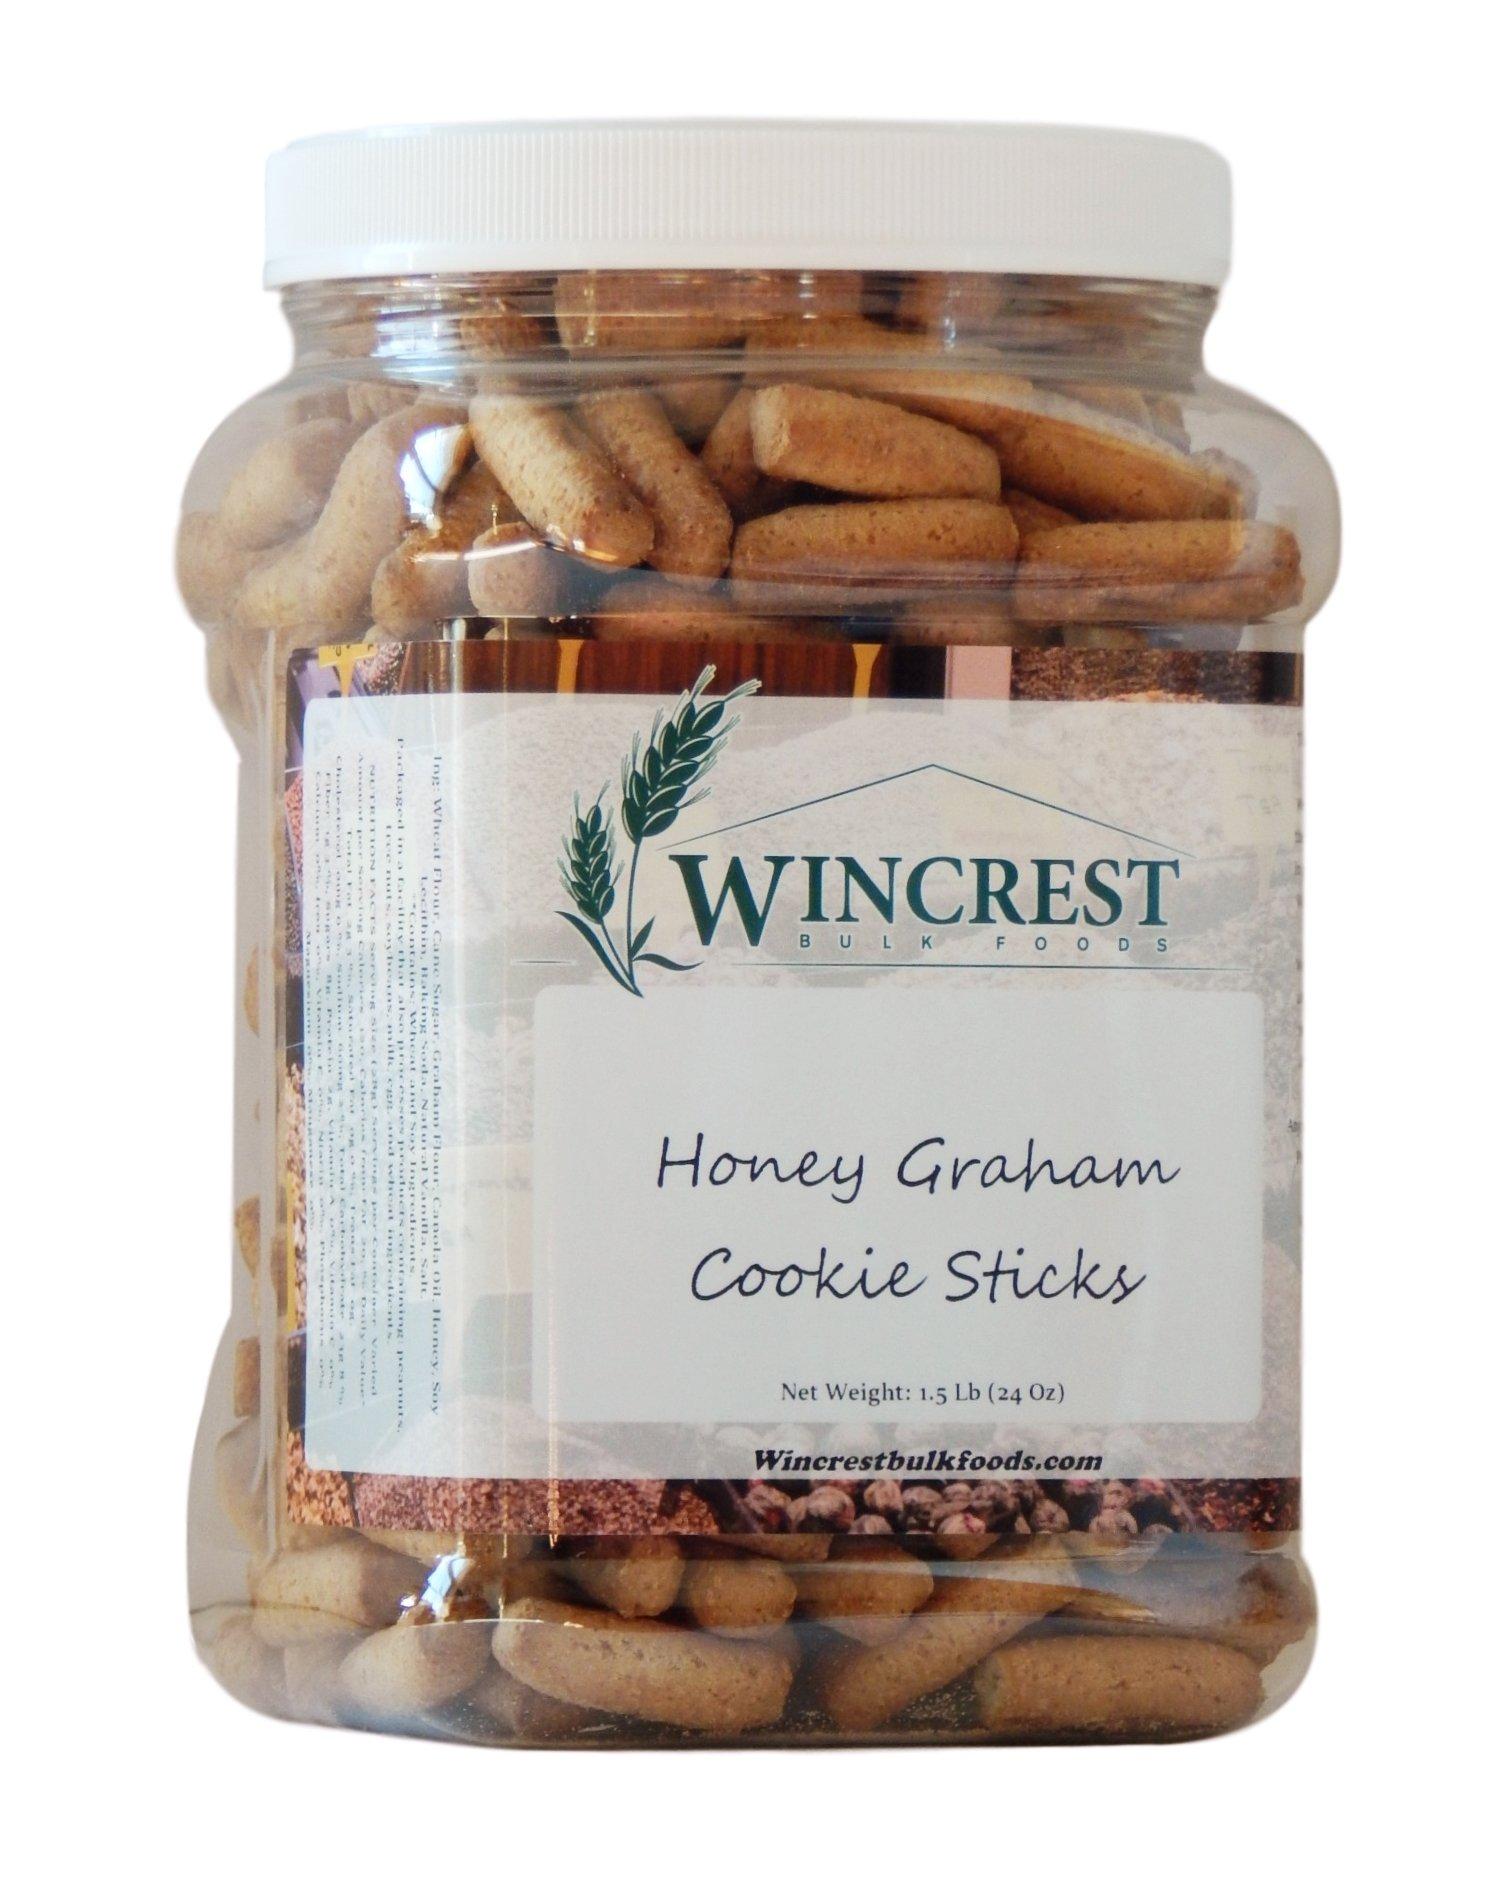 Honey Graham Pretzel Sticks - 1.5 Lb Tub